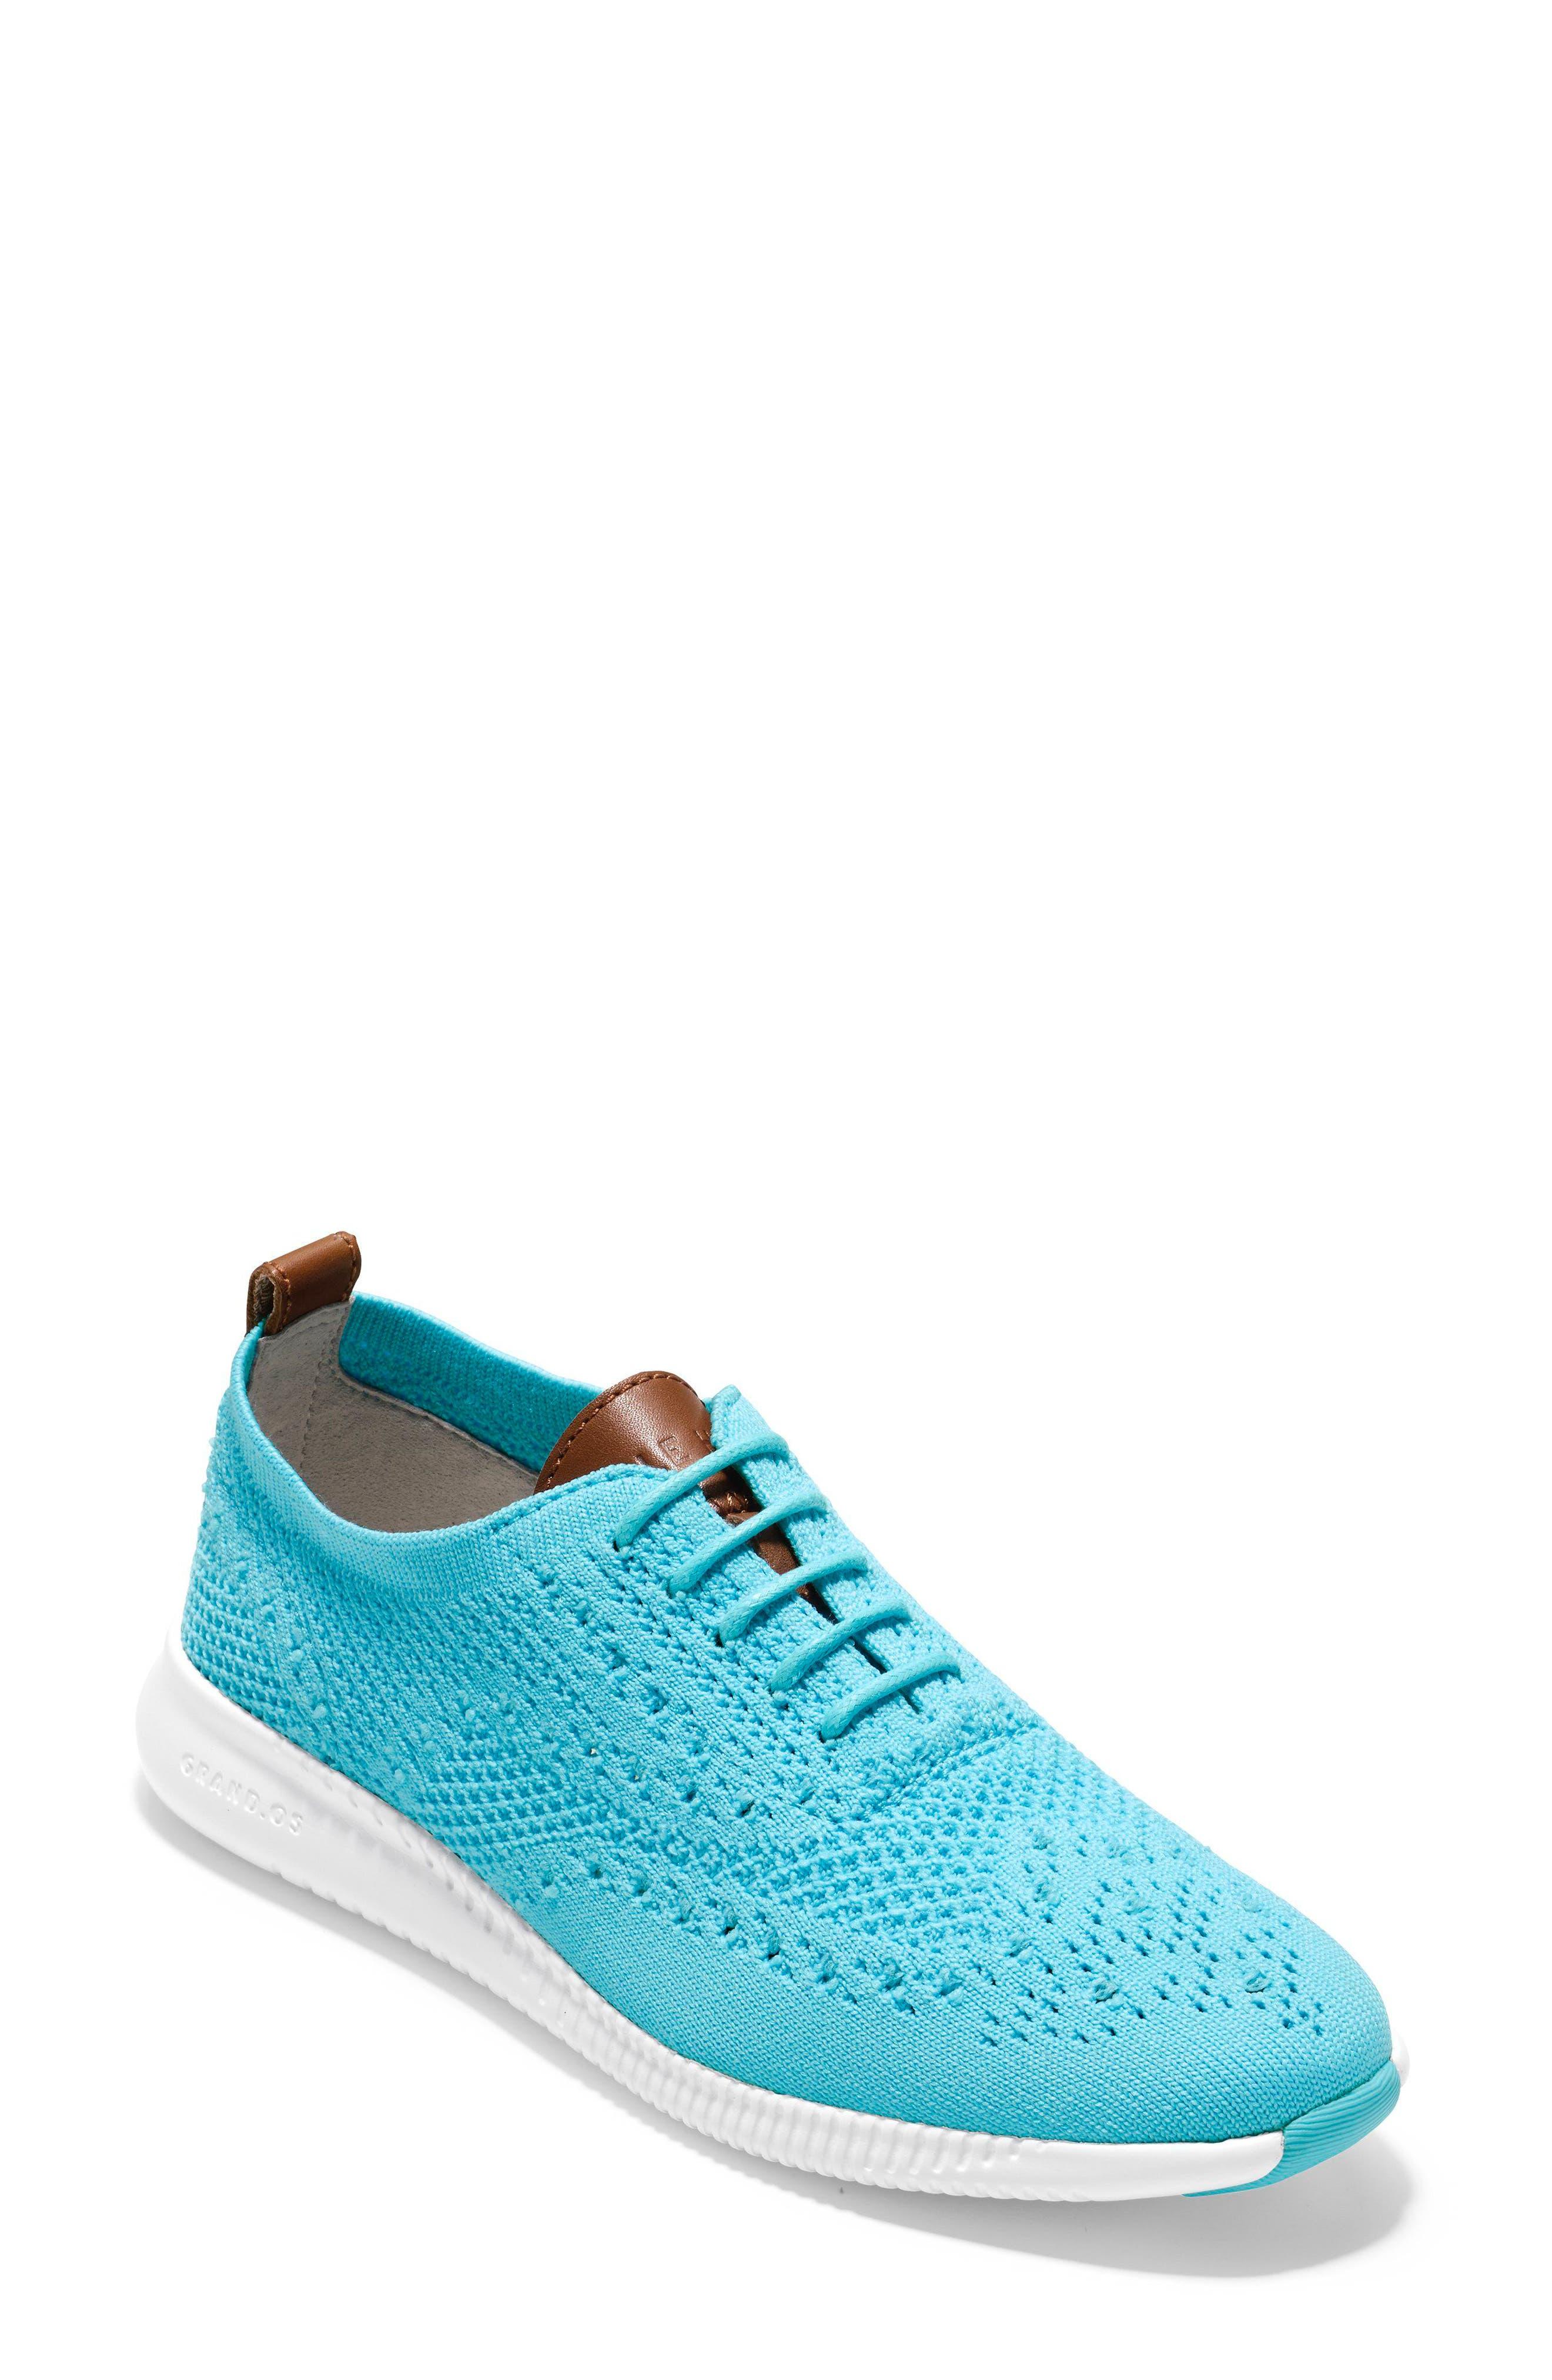 2.ZERØGRAND Stitchlite Wingtip Sneaker,                         Main,                         color, Bluefish Fabric